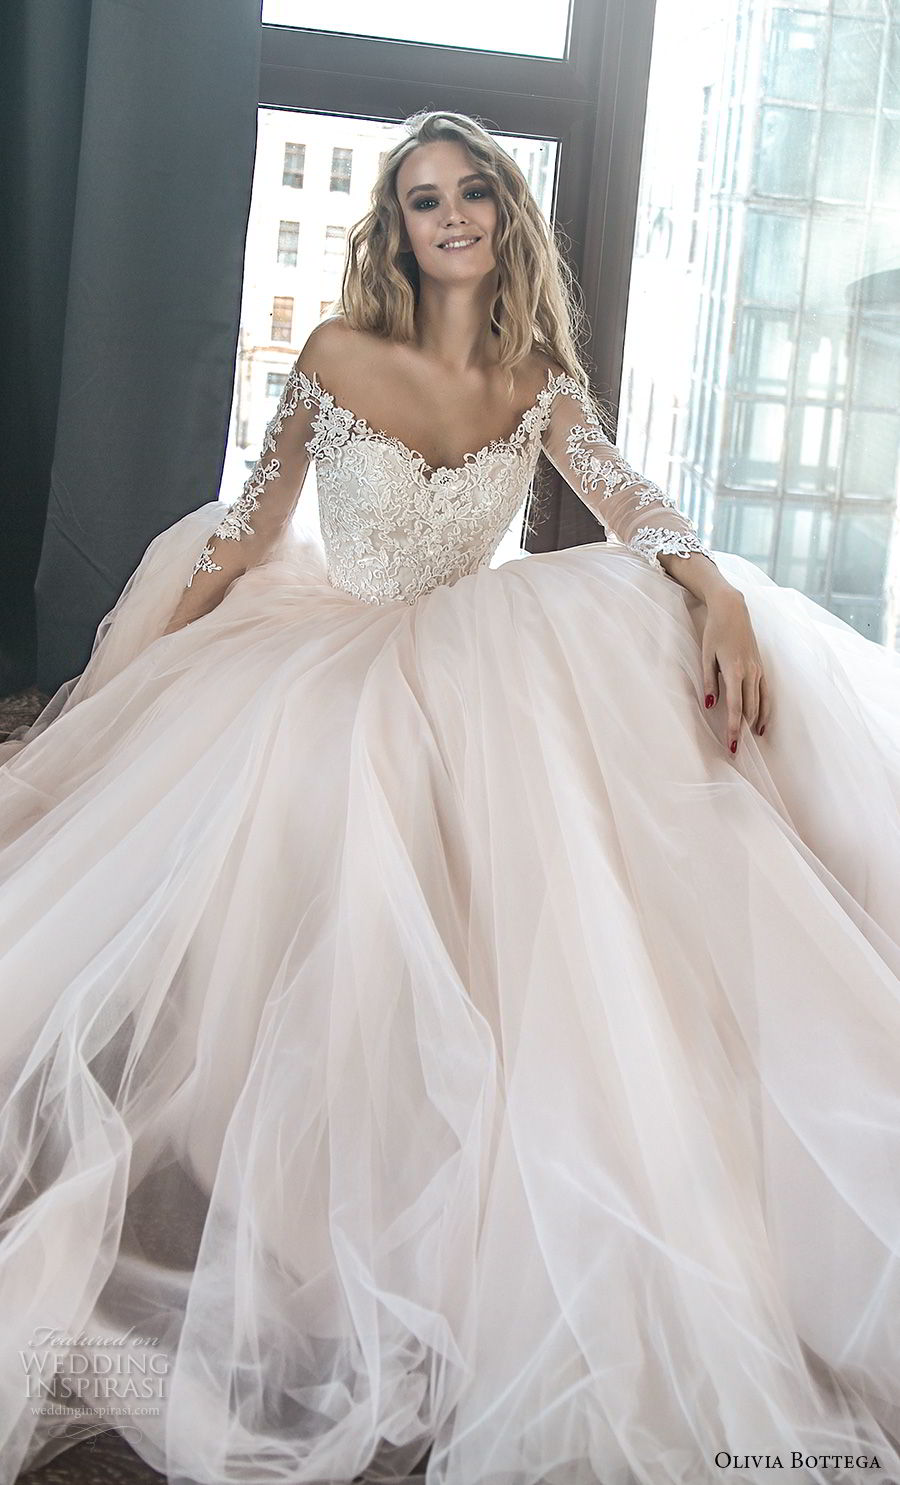 Wedding Dresses 2018.Olivia Bottega 2018 Wedding Dresses Wedding Inspirasi